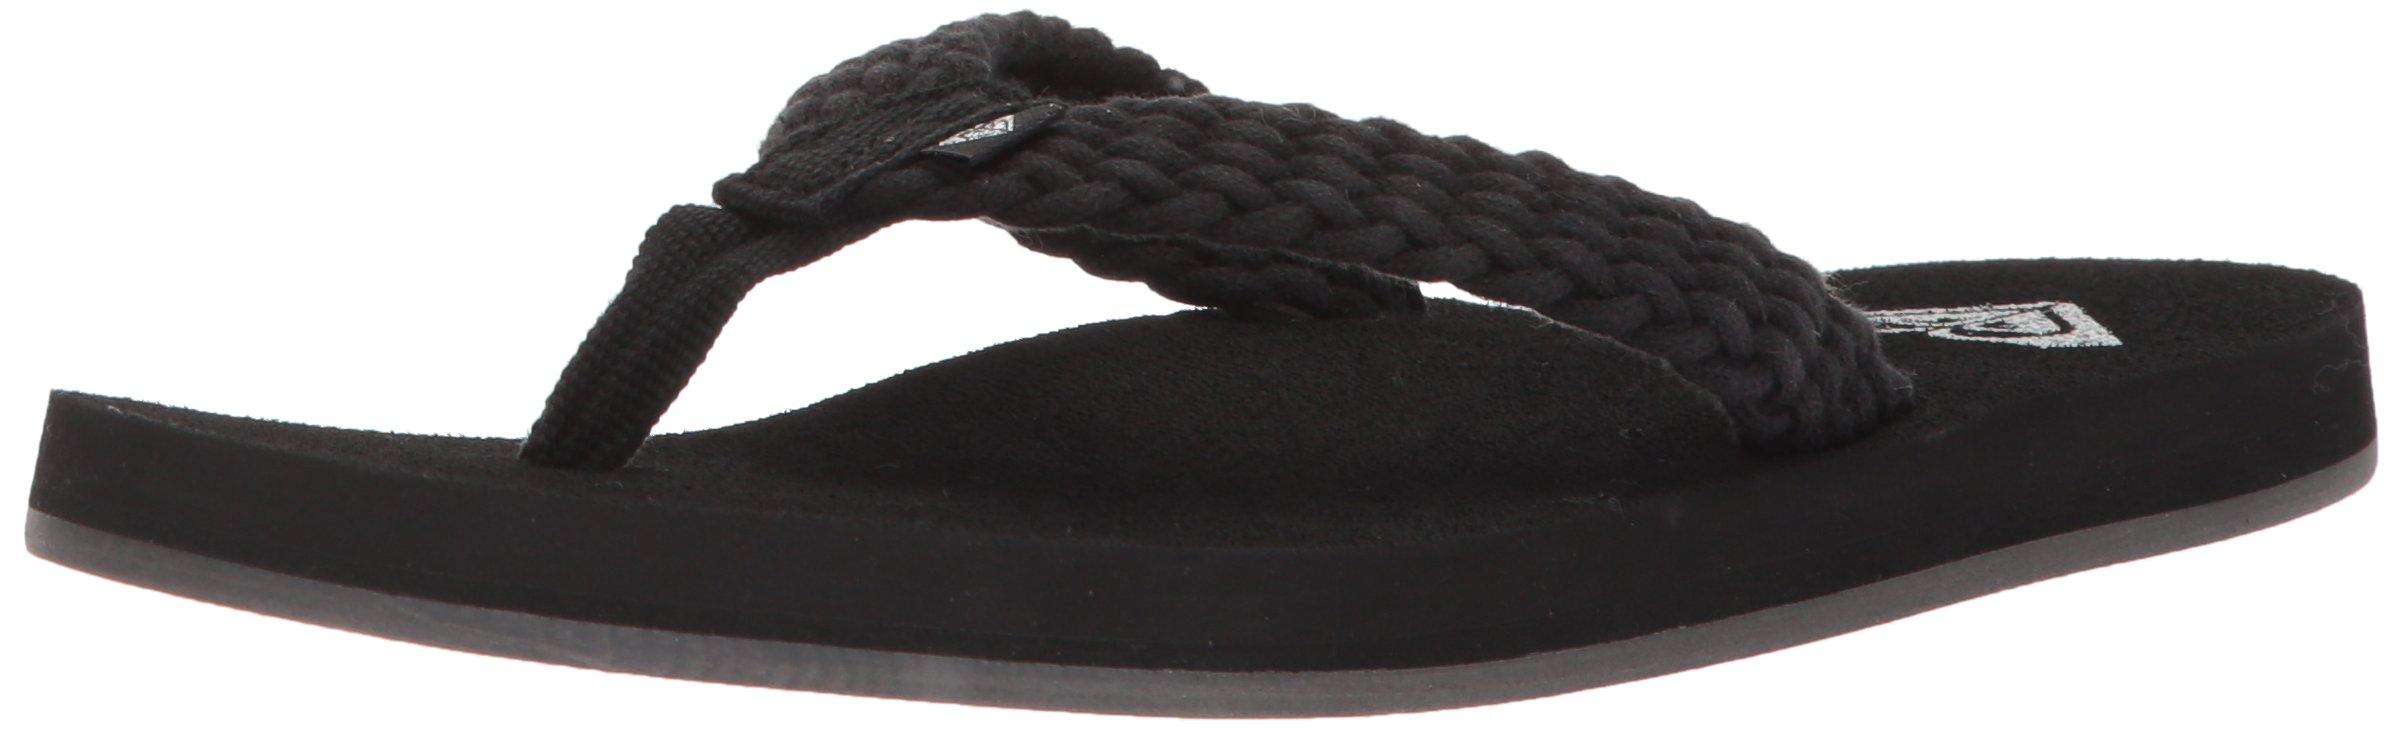 Roxy Womens Porto Sandal Flip Flop